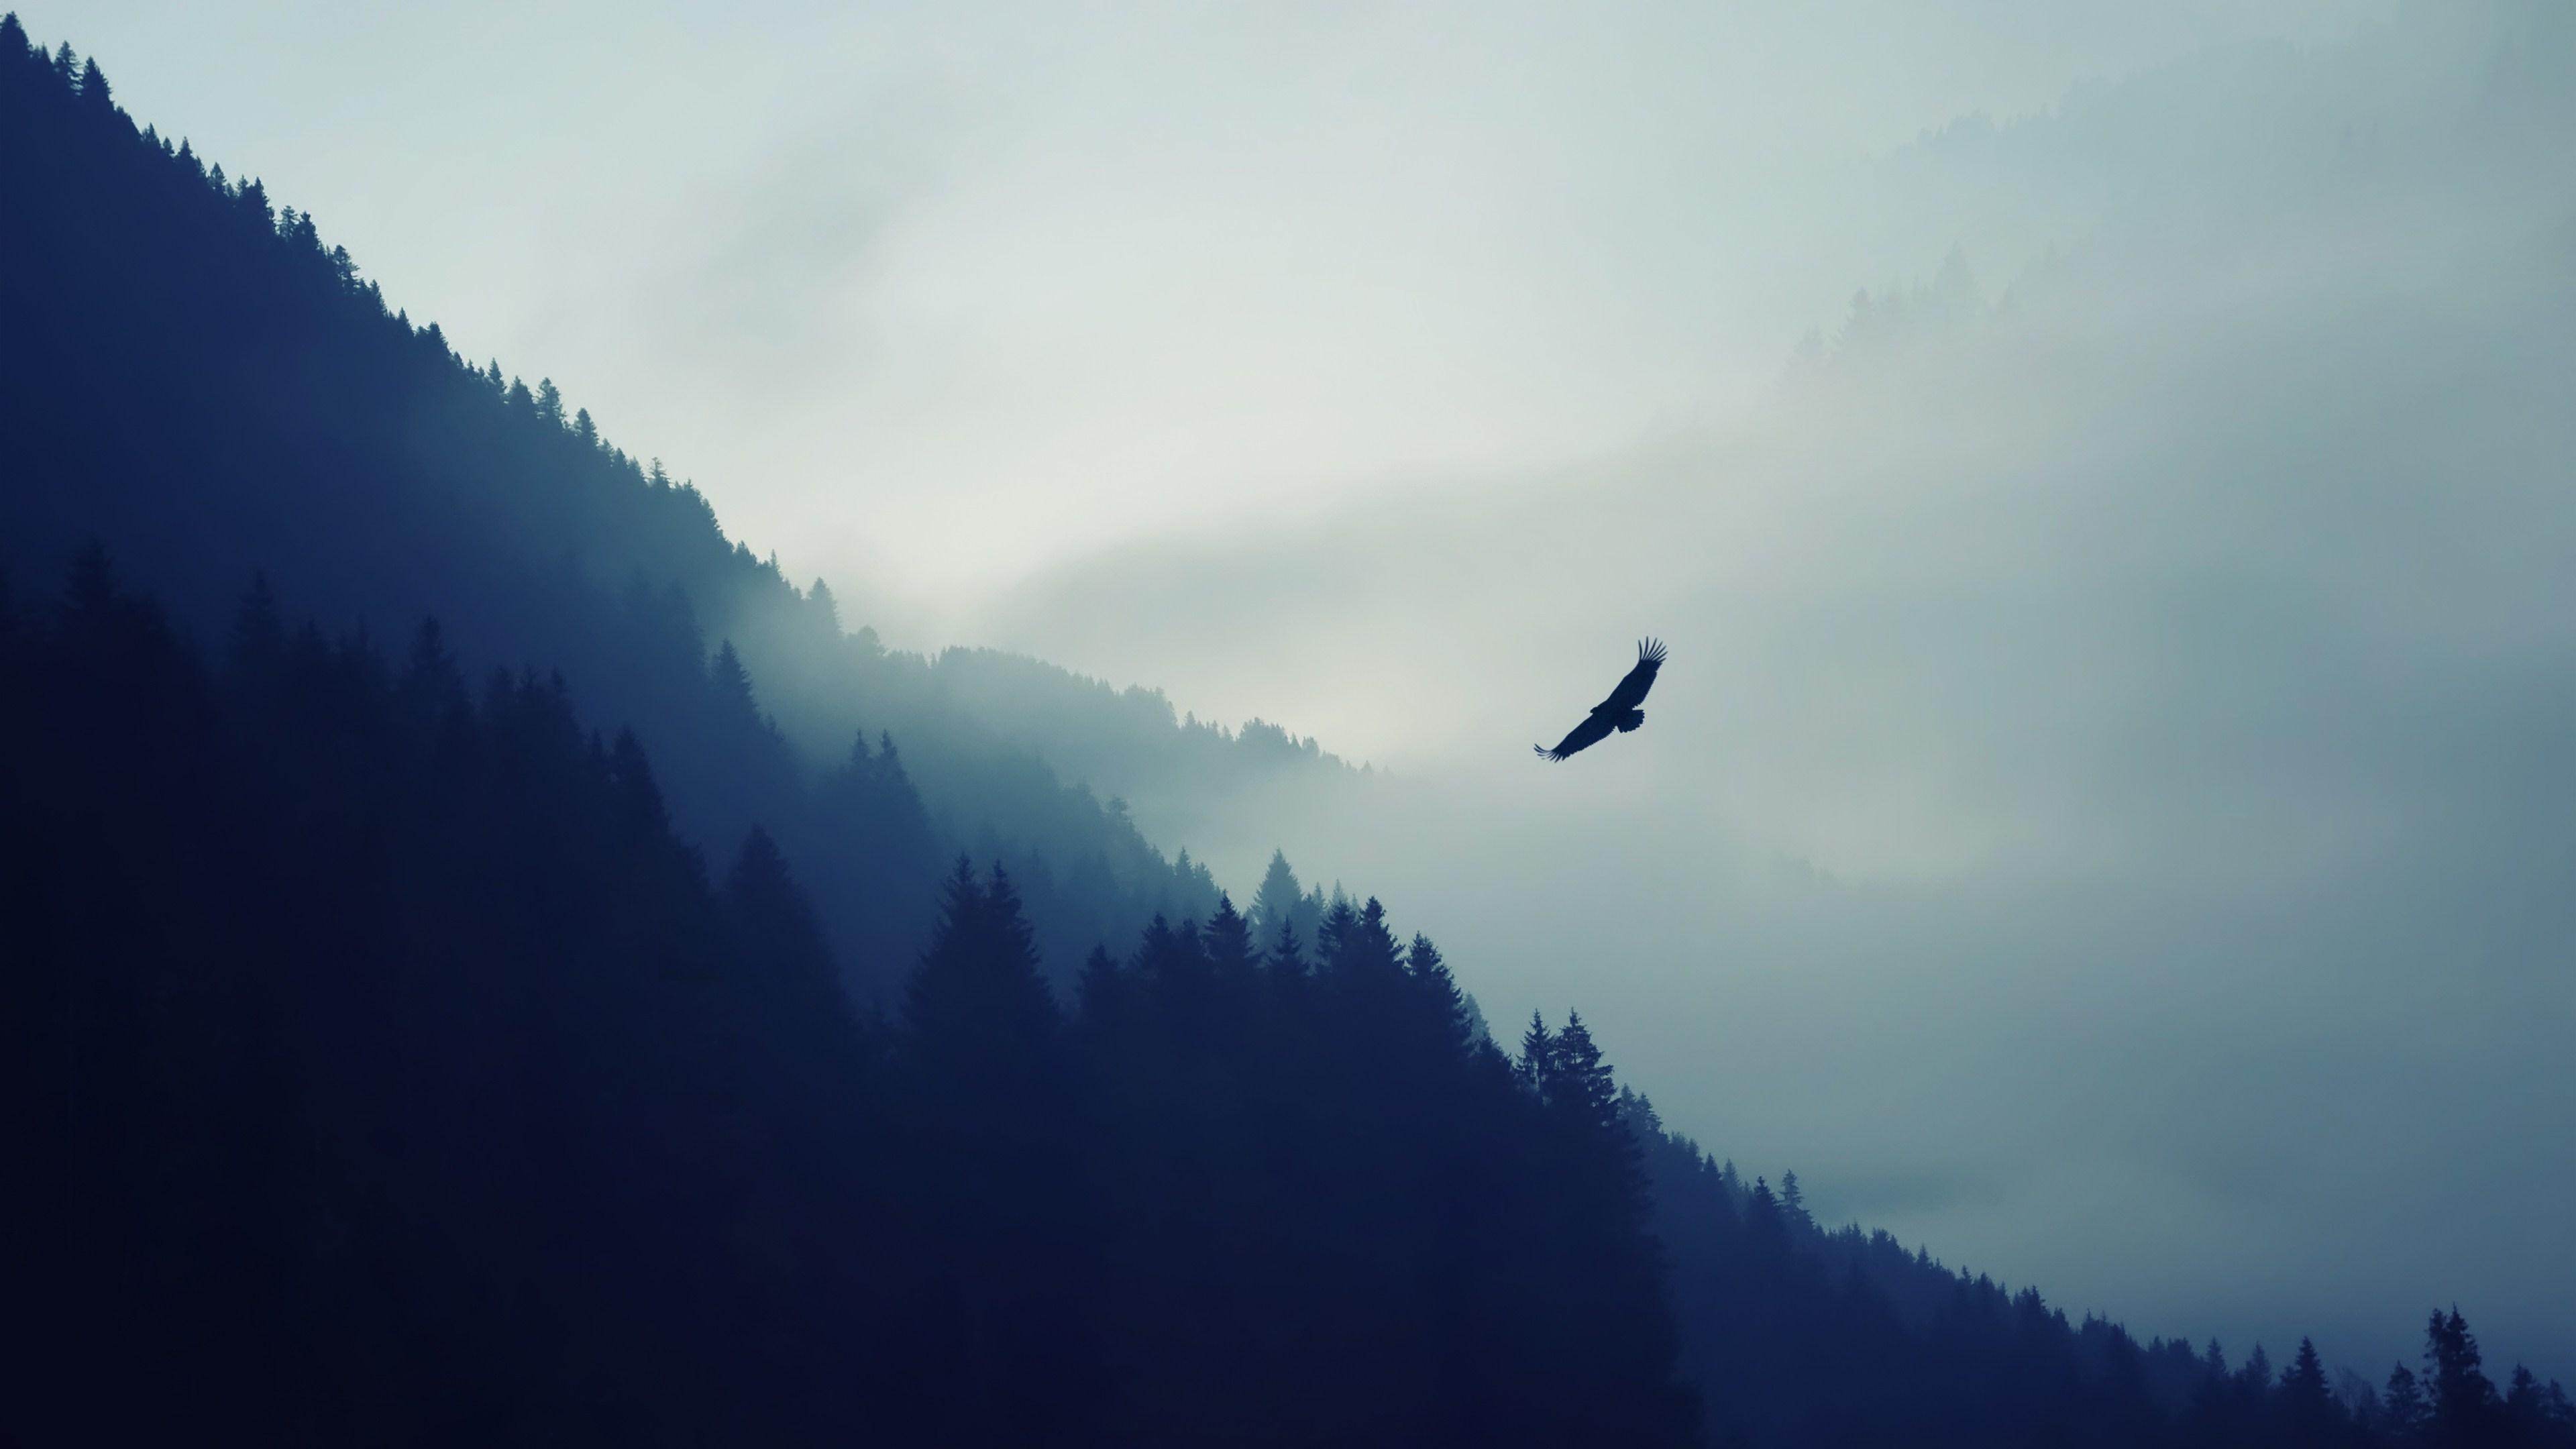 Mountain Forest Fog Valley Eagle 4K Ultra HD Desktop Wallpaper